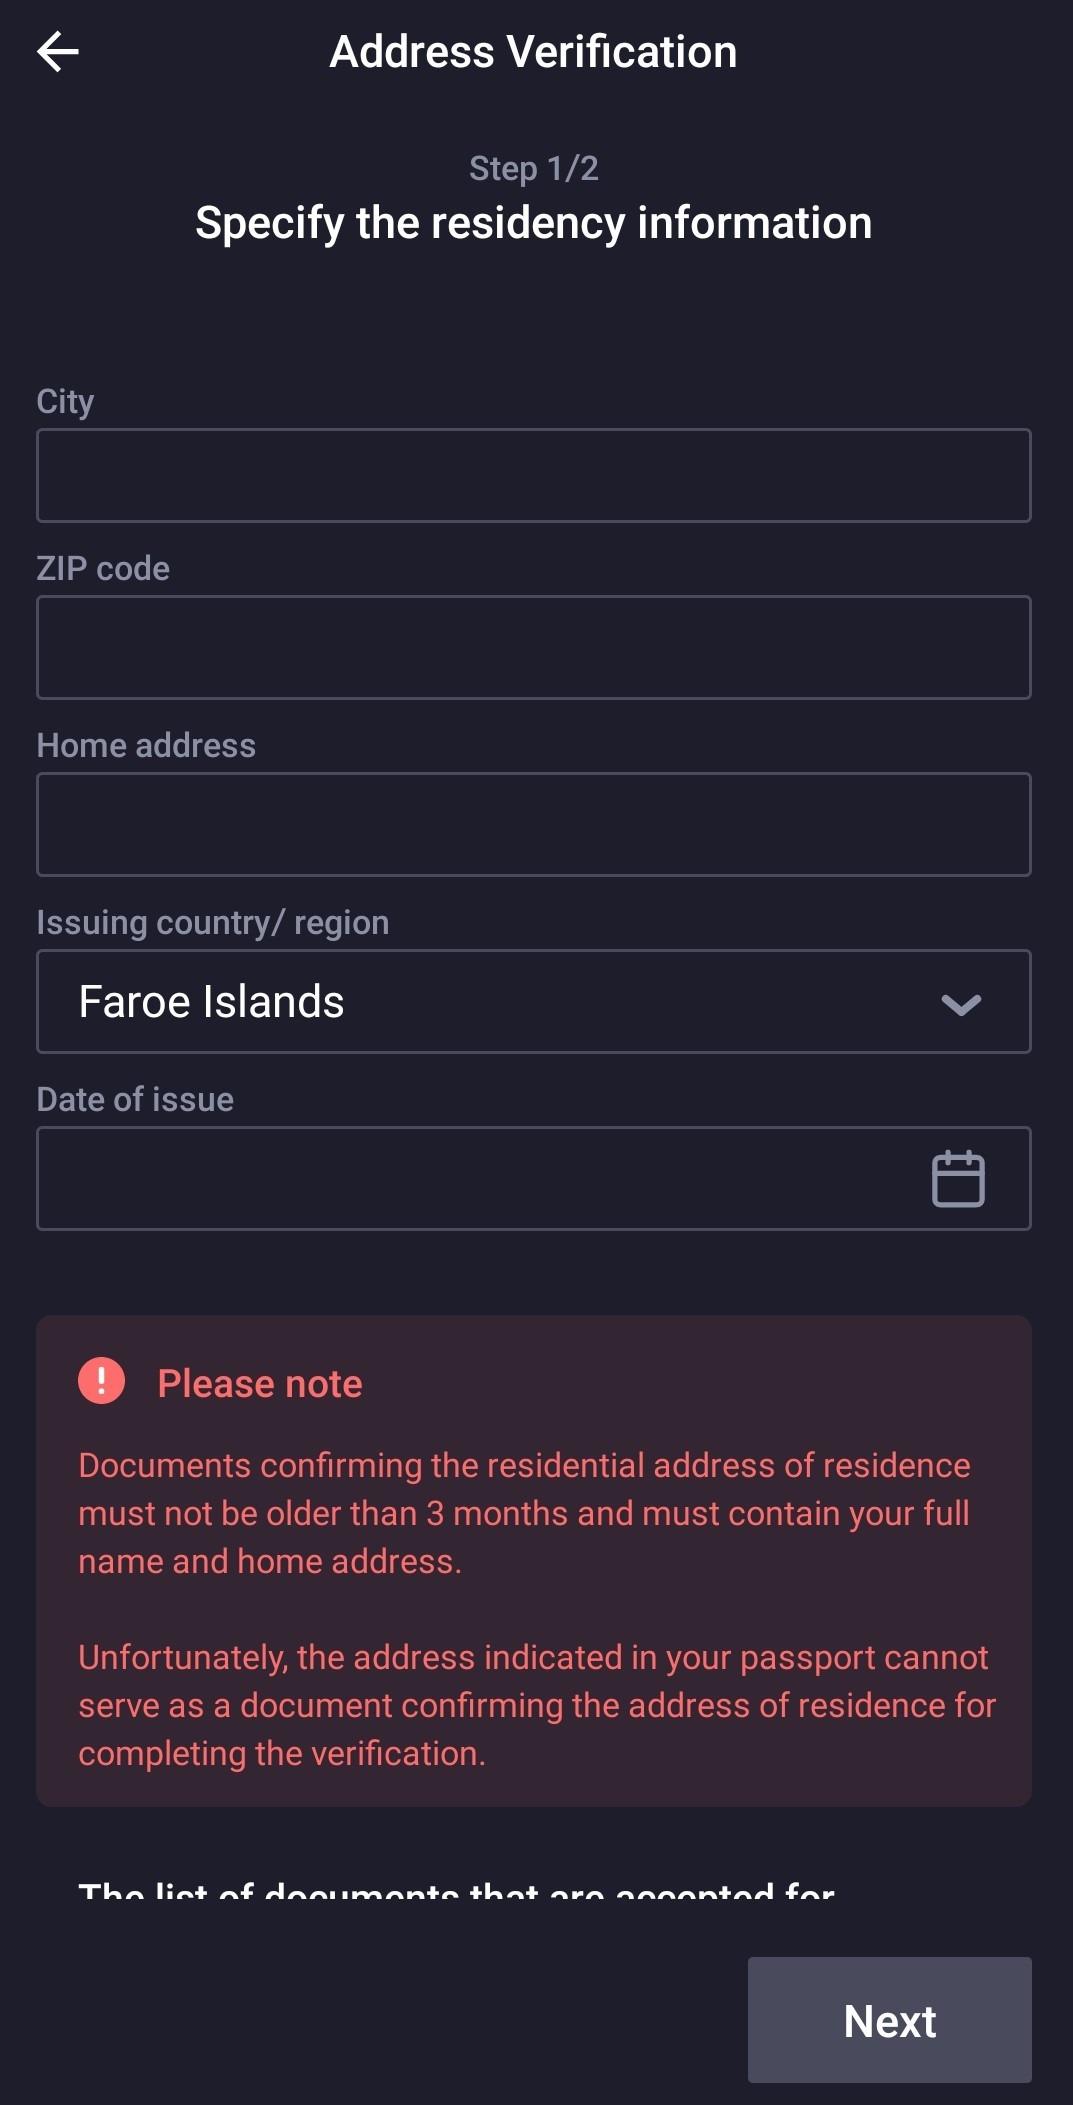 Address verification 1